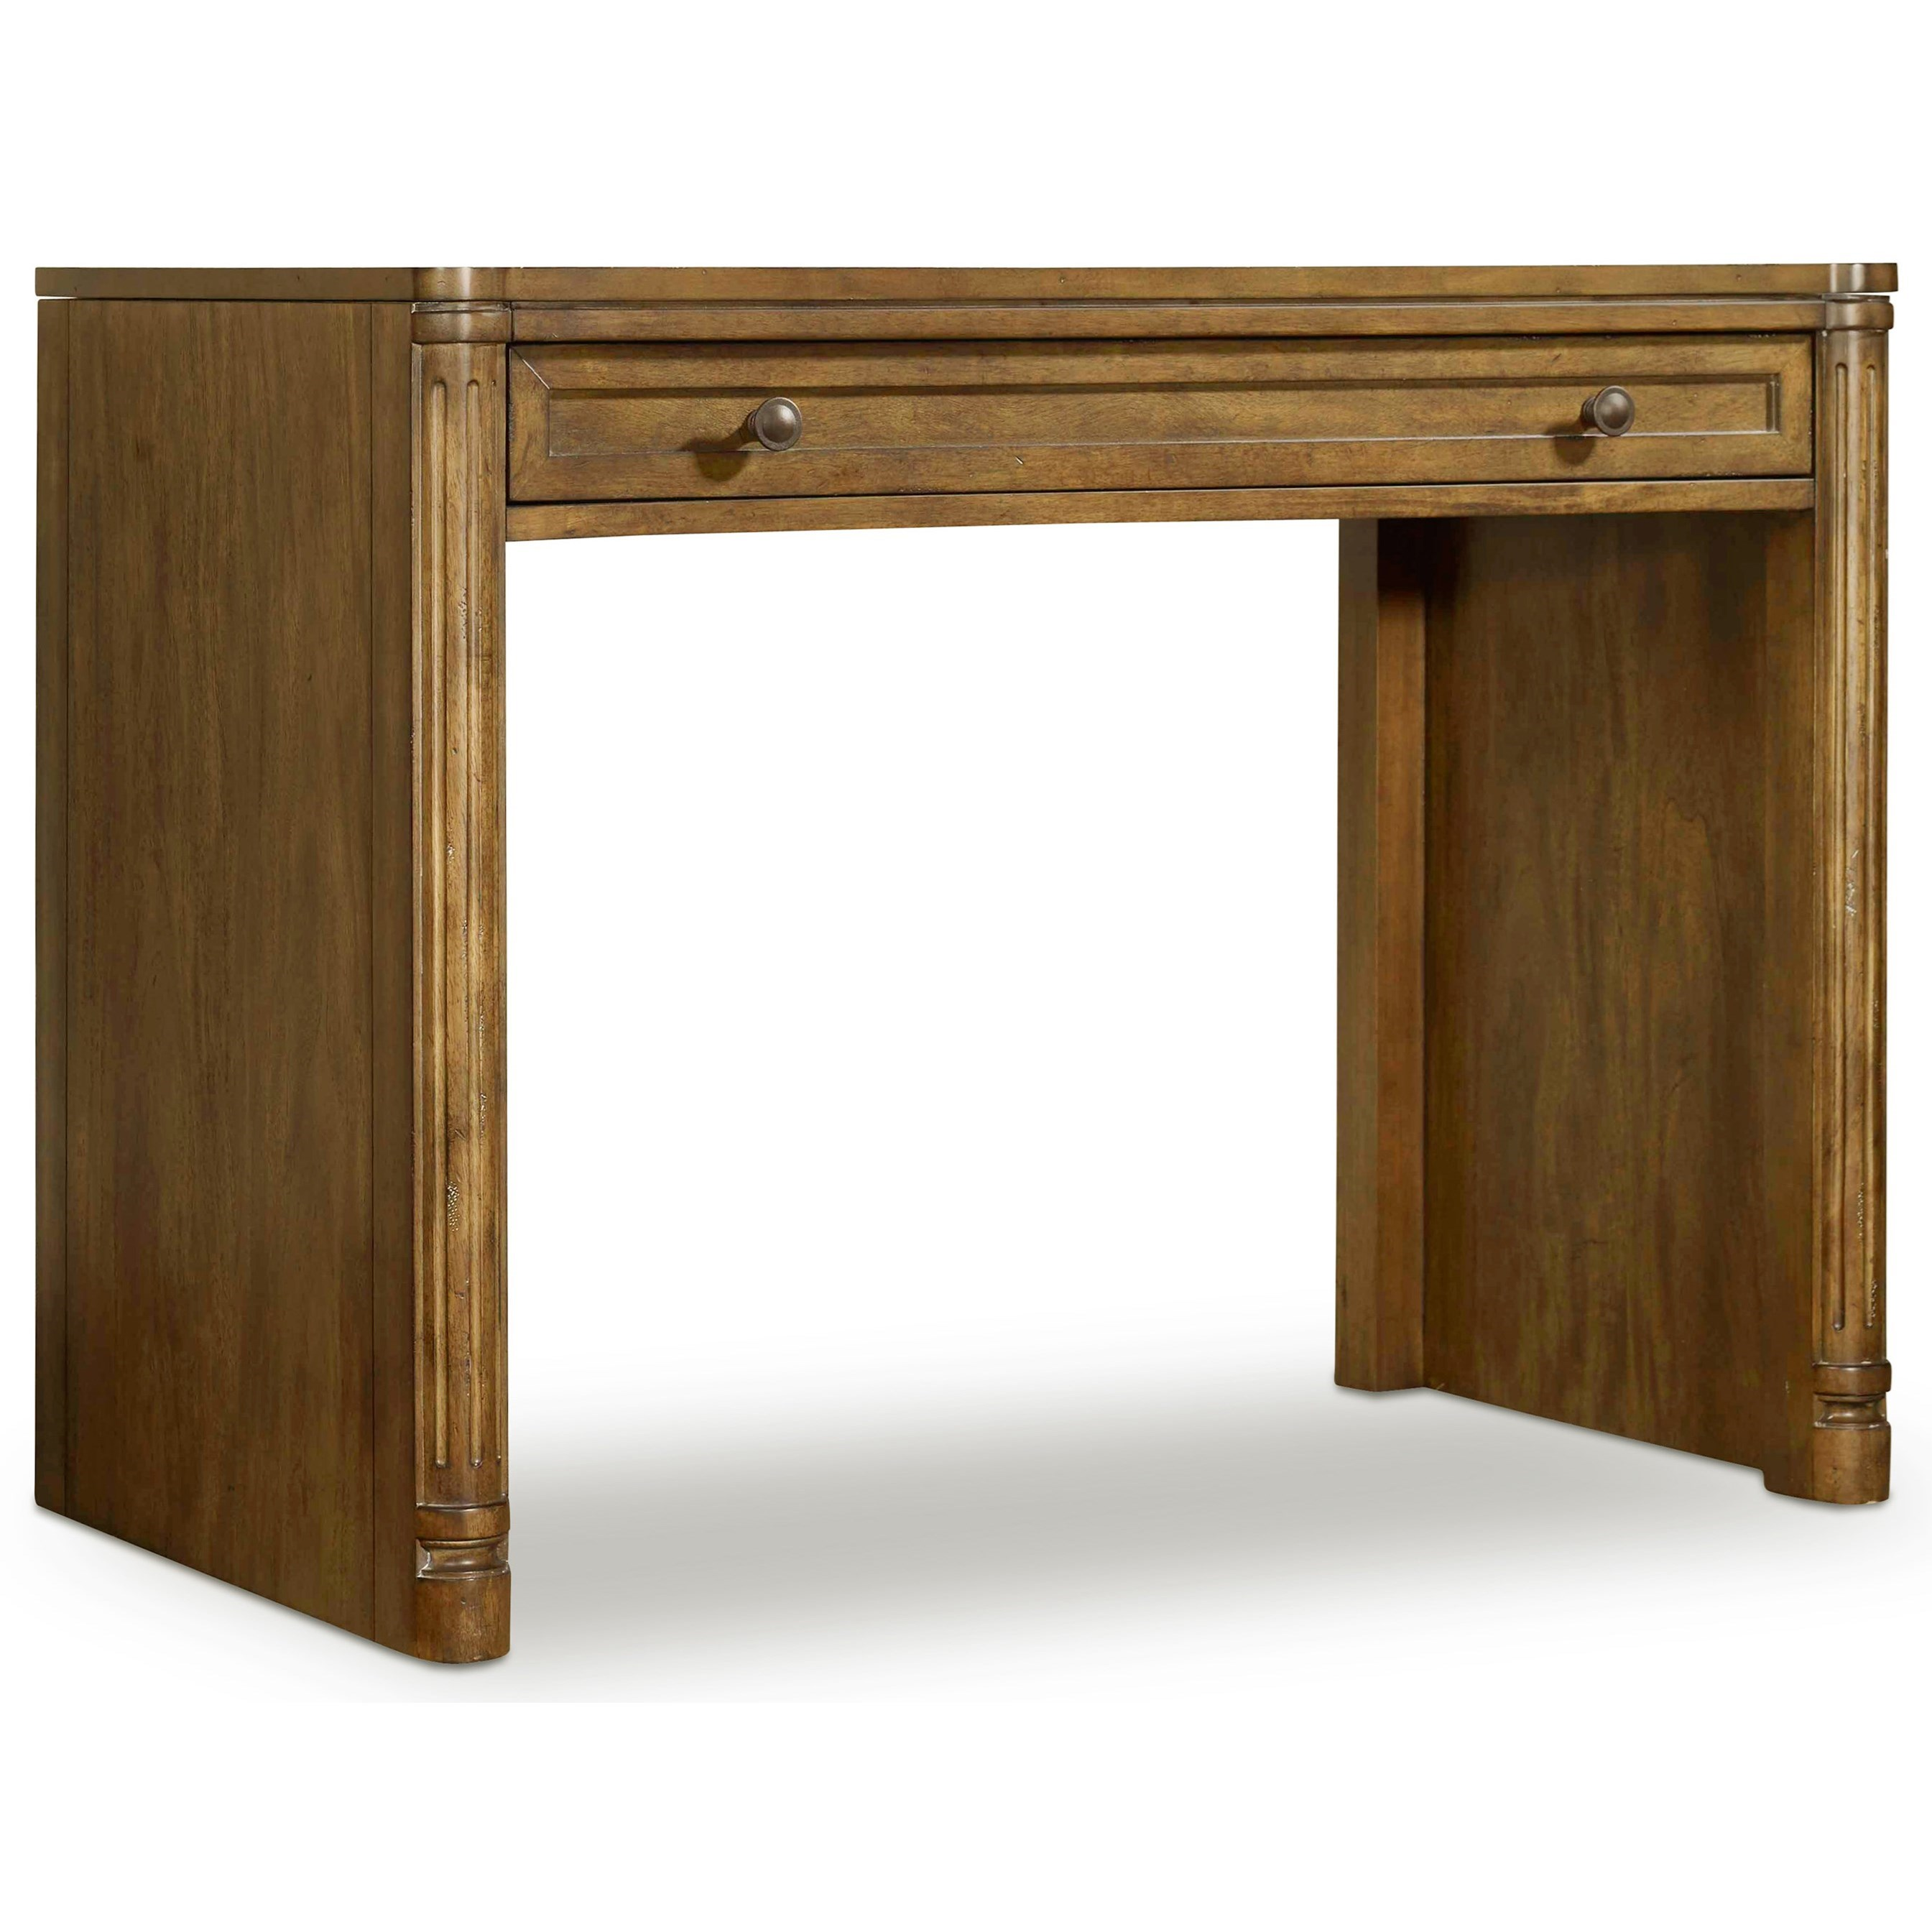 Hooker Furniture Saint Armand Wall Desk - Item Number: 5600-70436